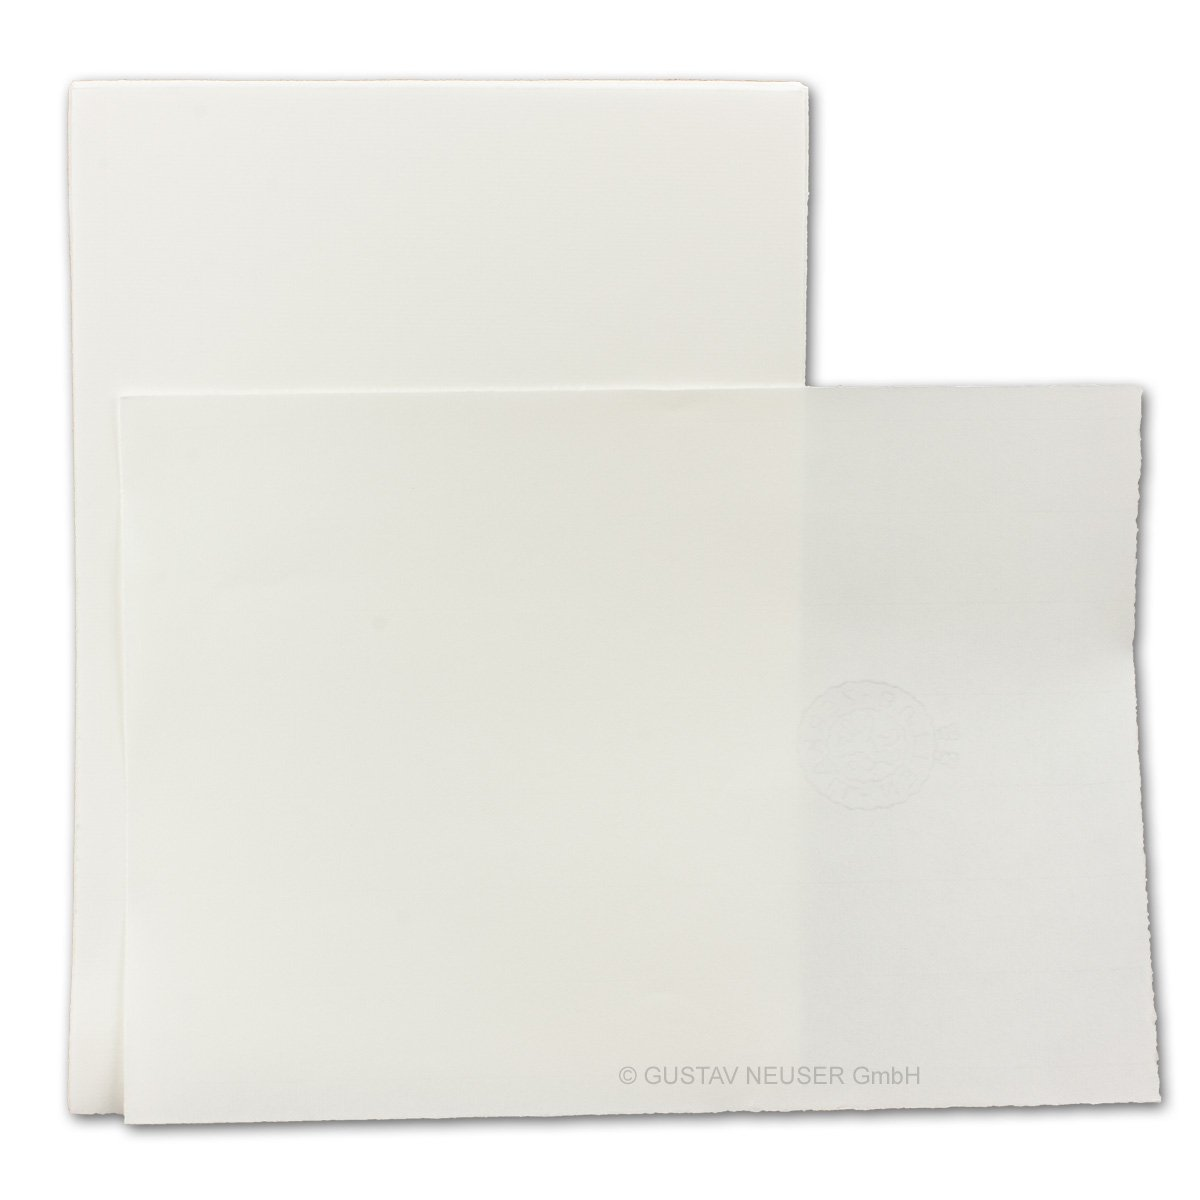 75er 75er 75er Briefset aus Echtem Büttenpapier I 150-teilig I Din A4 Bogen  Din Lang Umschläge gefüttert I Gebrochen-Weiß I Altweiß B07DW6HT4M | Angemessene Lieferung und pünktliche Lieferung  0a5e81